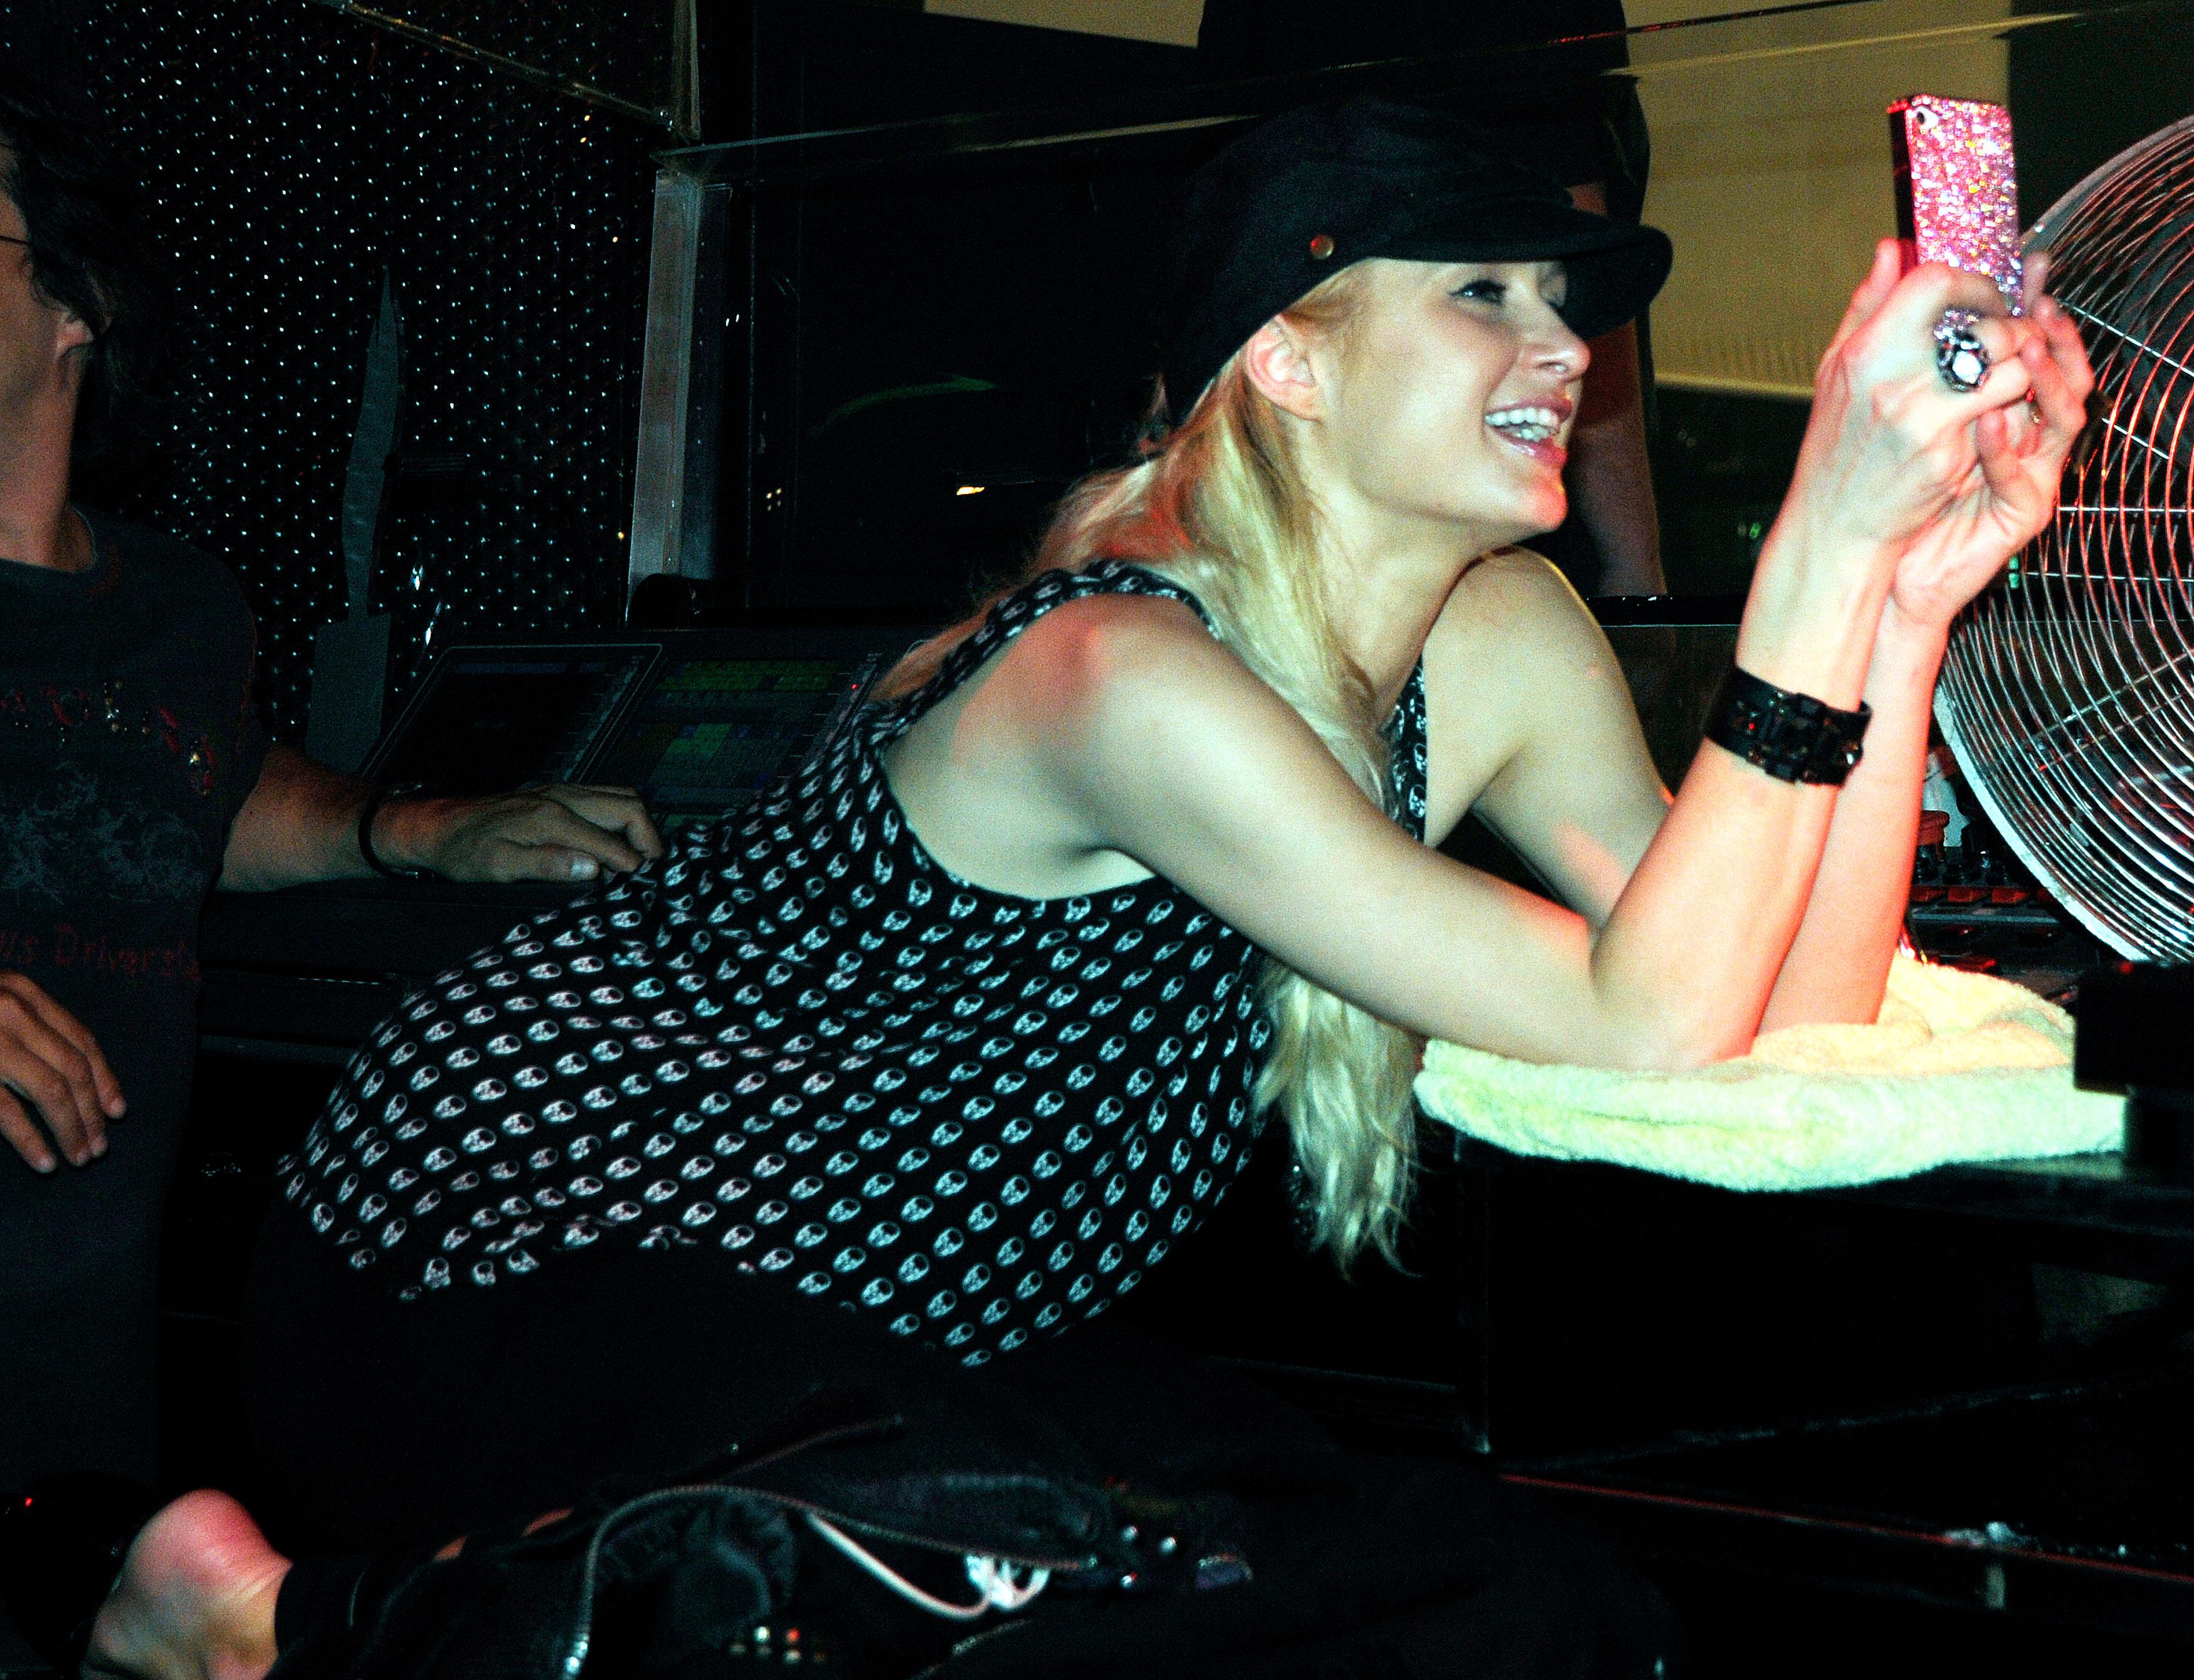 Paris Hilton står med sin telefon til en fest (Foto: All Over)